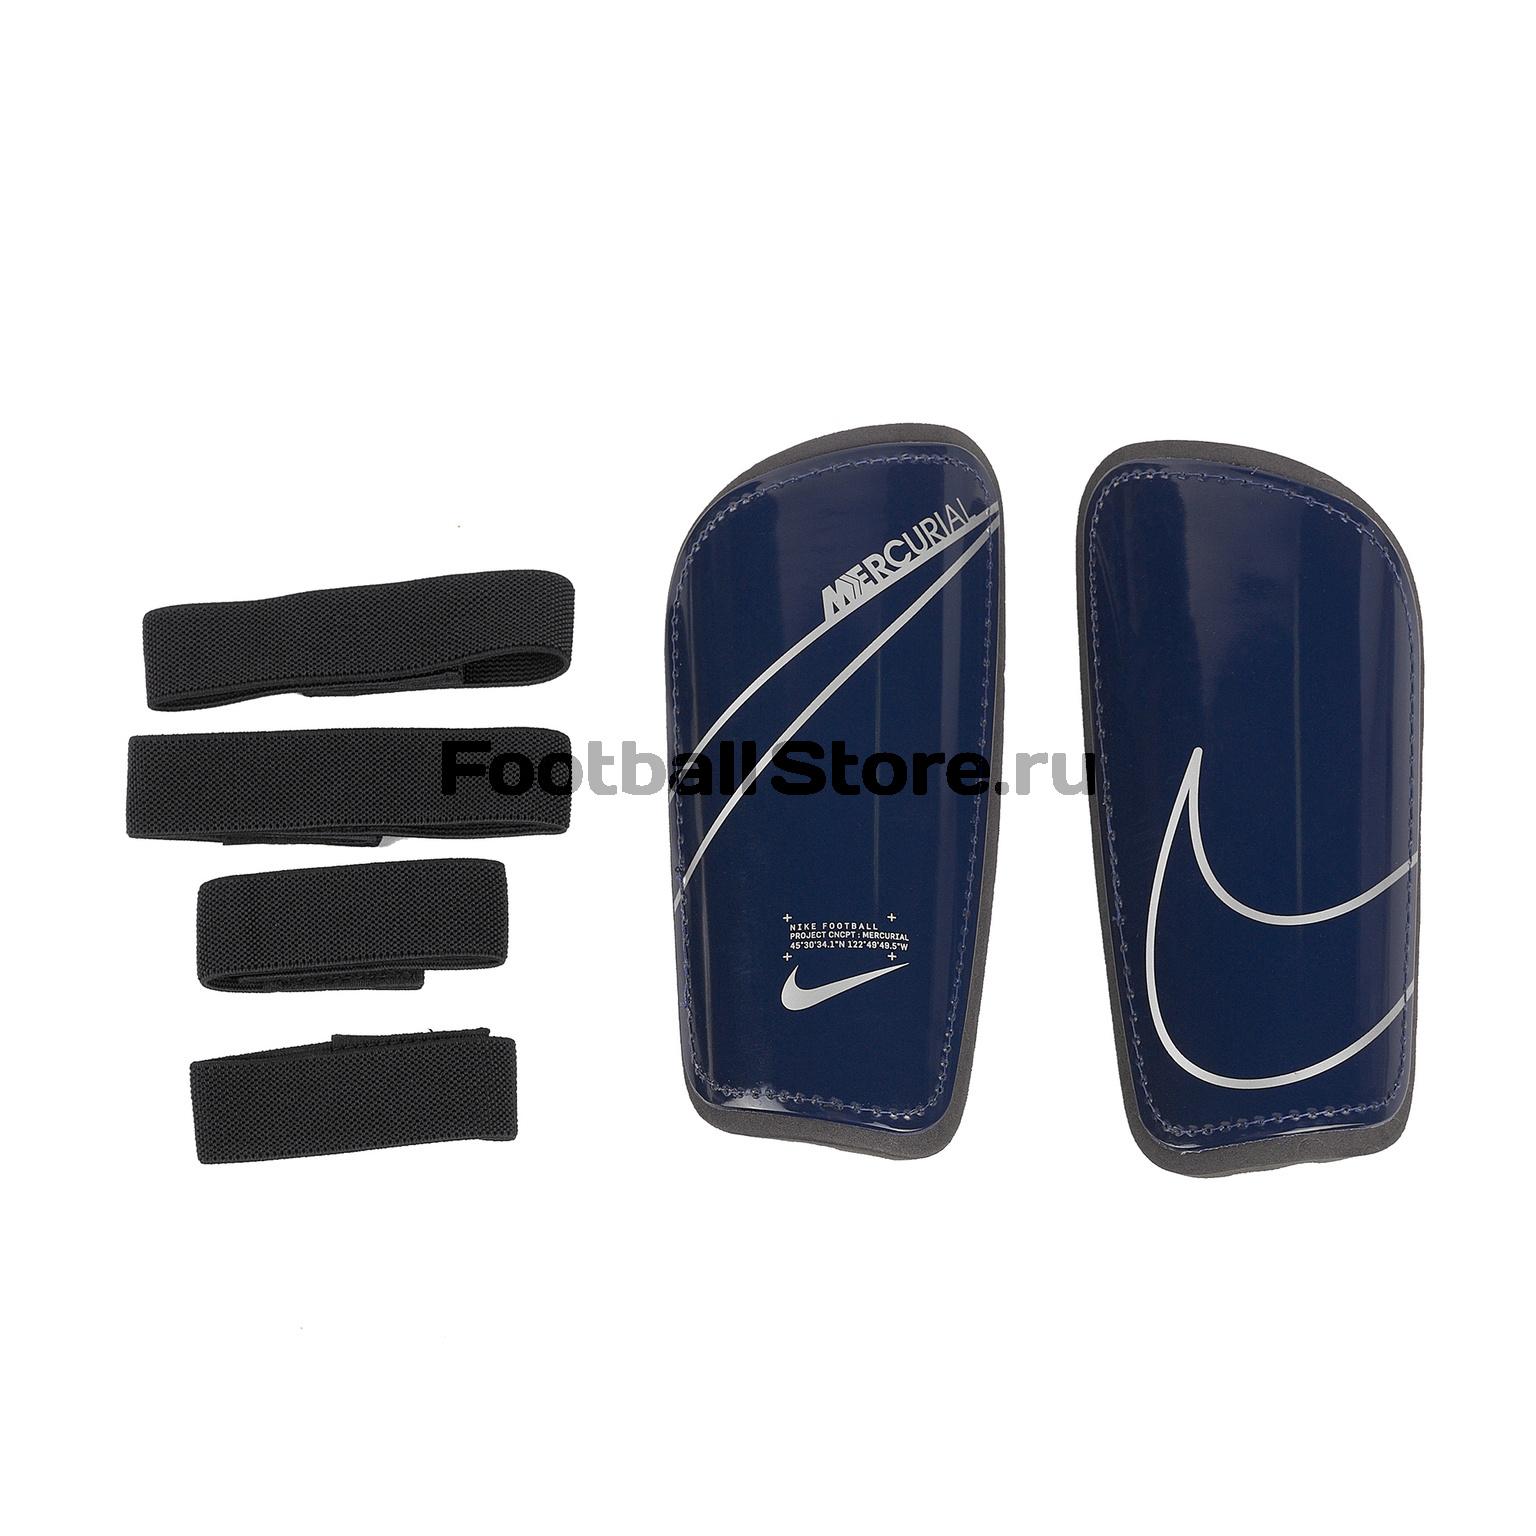 Щитки Nike Mercurial Hardshell SP2128-492 обувь для зала nike mercurial x finale ii ic 831974 616